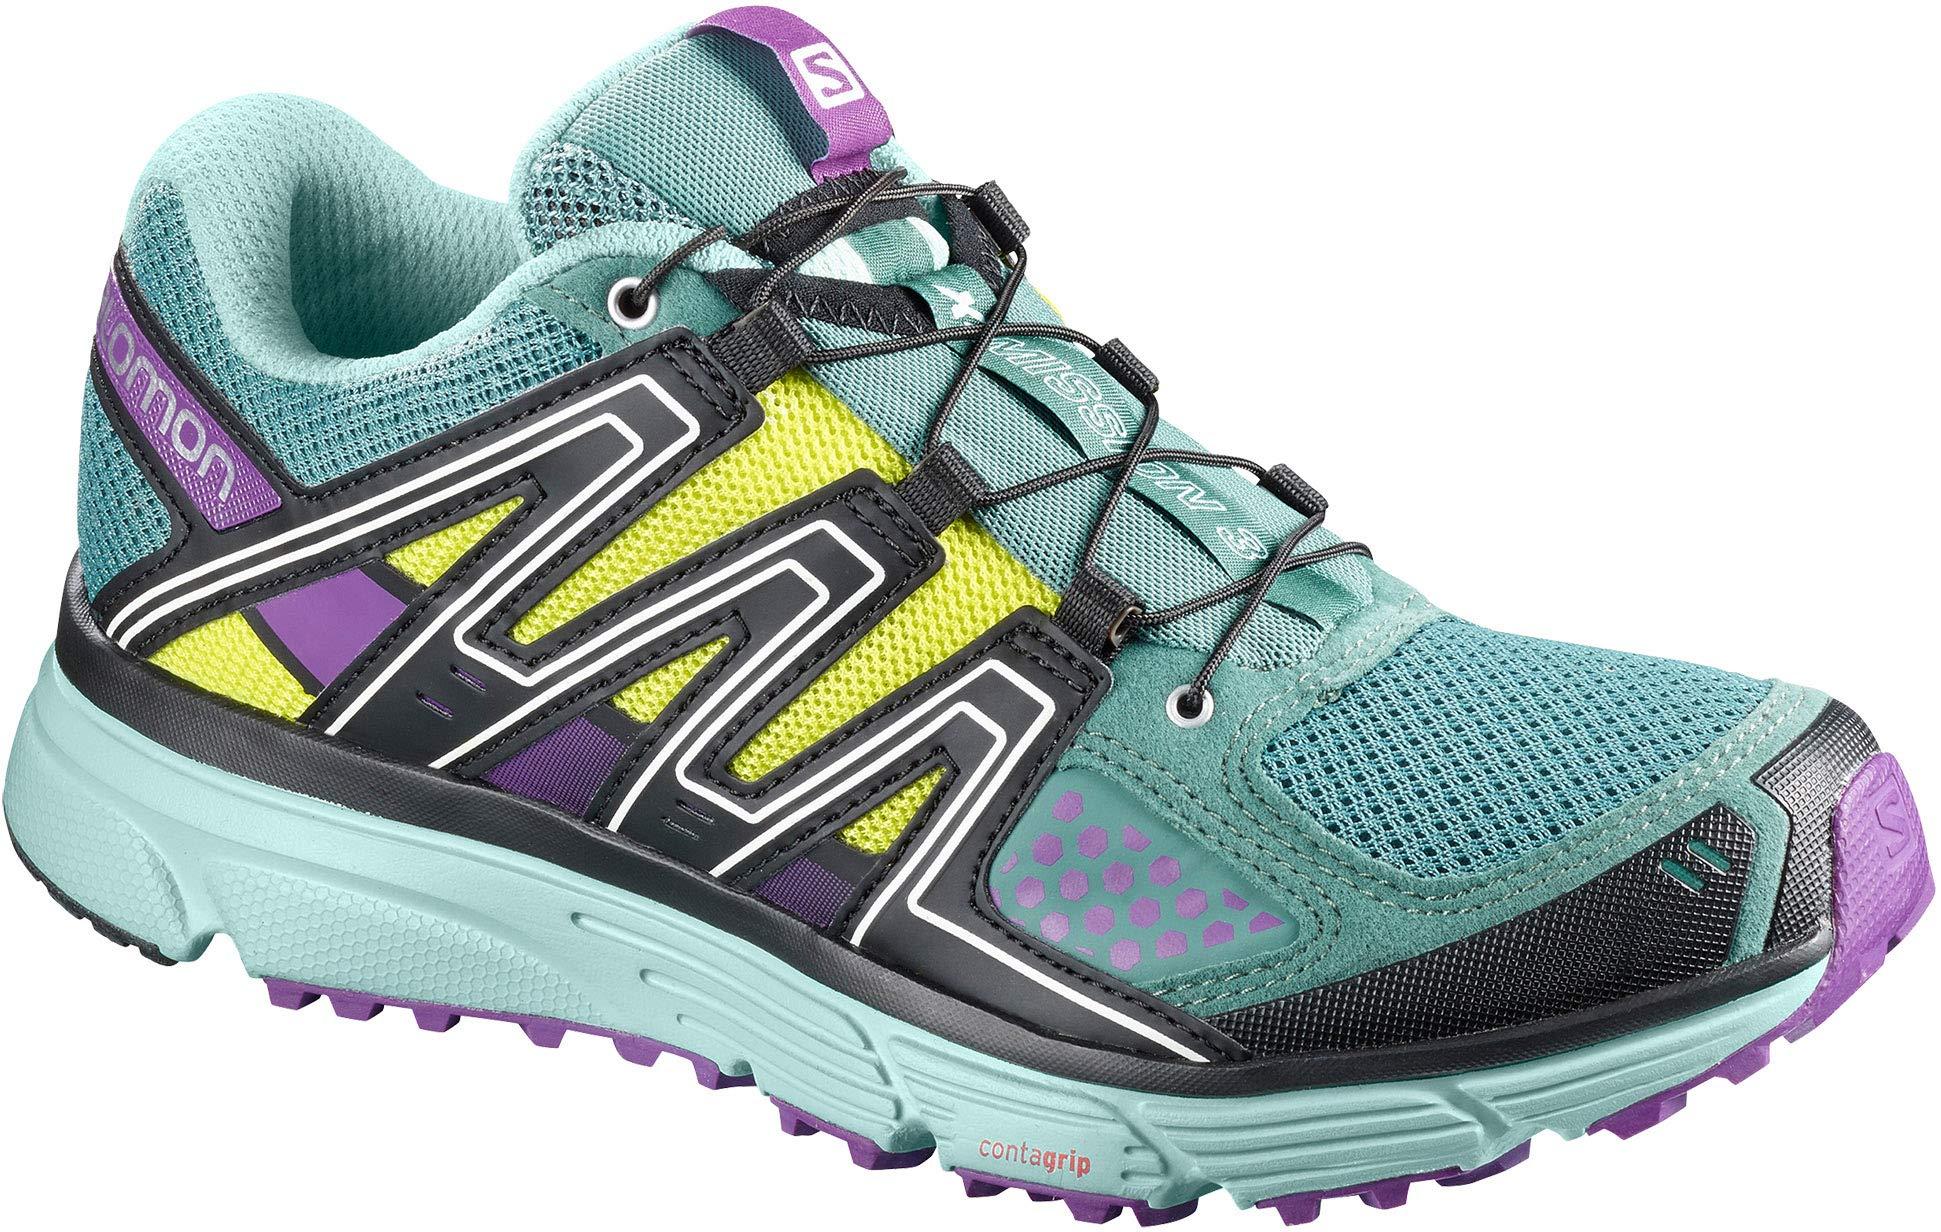 SALOMON X-Mission 3 Trail Running Shoes Womens Sz 9 North Atlantic/Eggshell by SALOMON